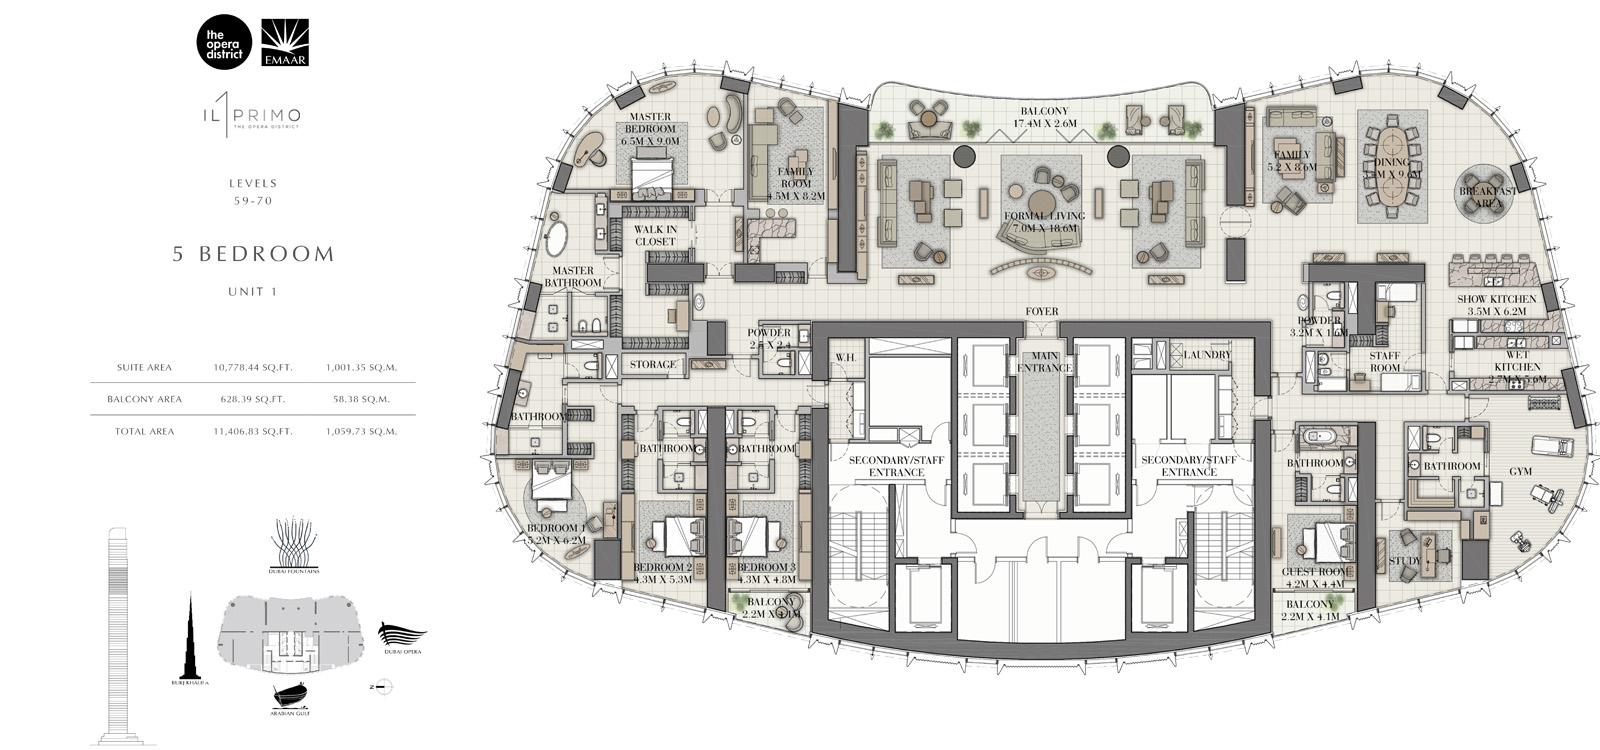 5 Bedroom Unit 1, Size 11406 sq ft